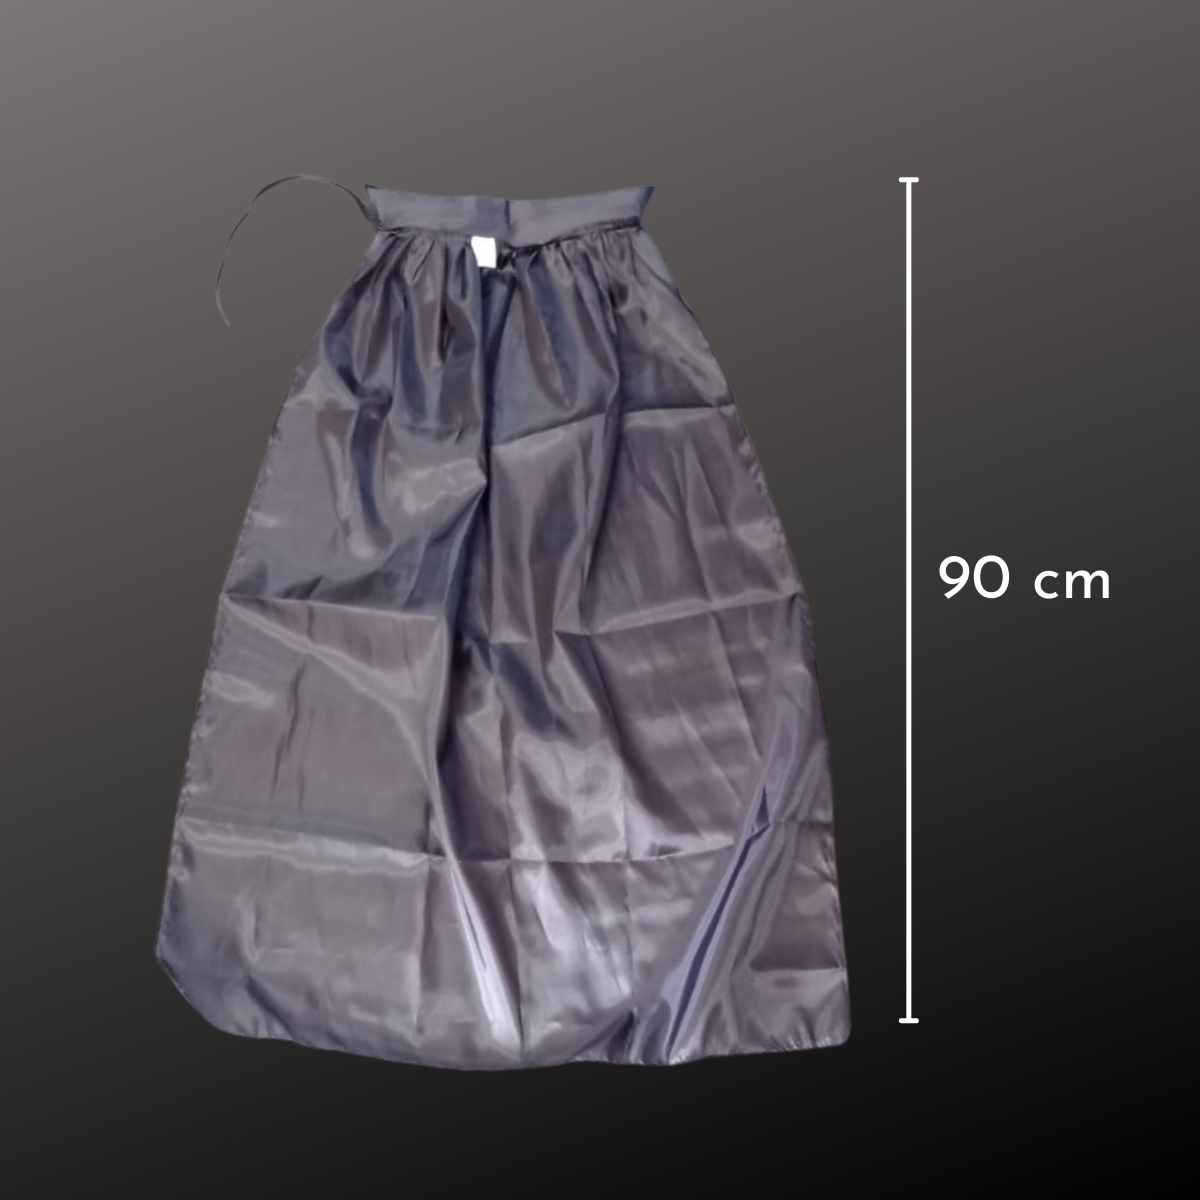 Capa Preta Infantil Bember 90cm